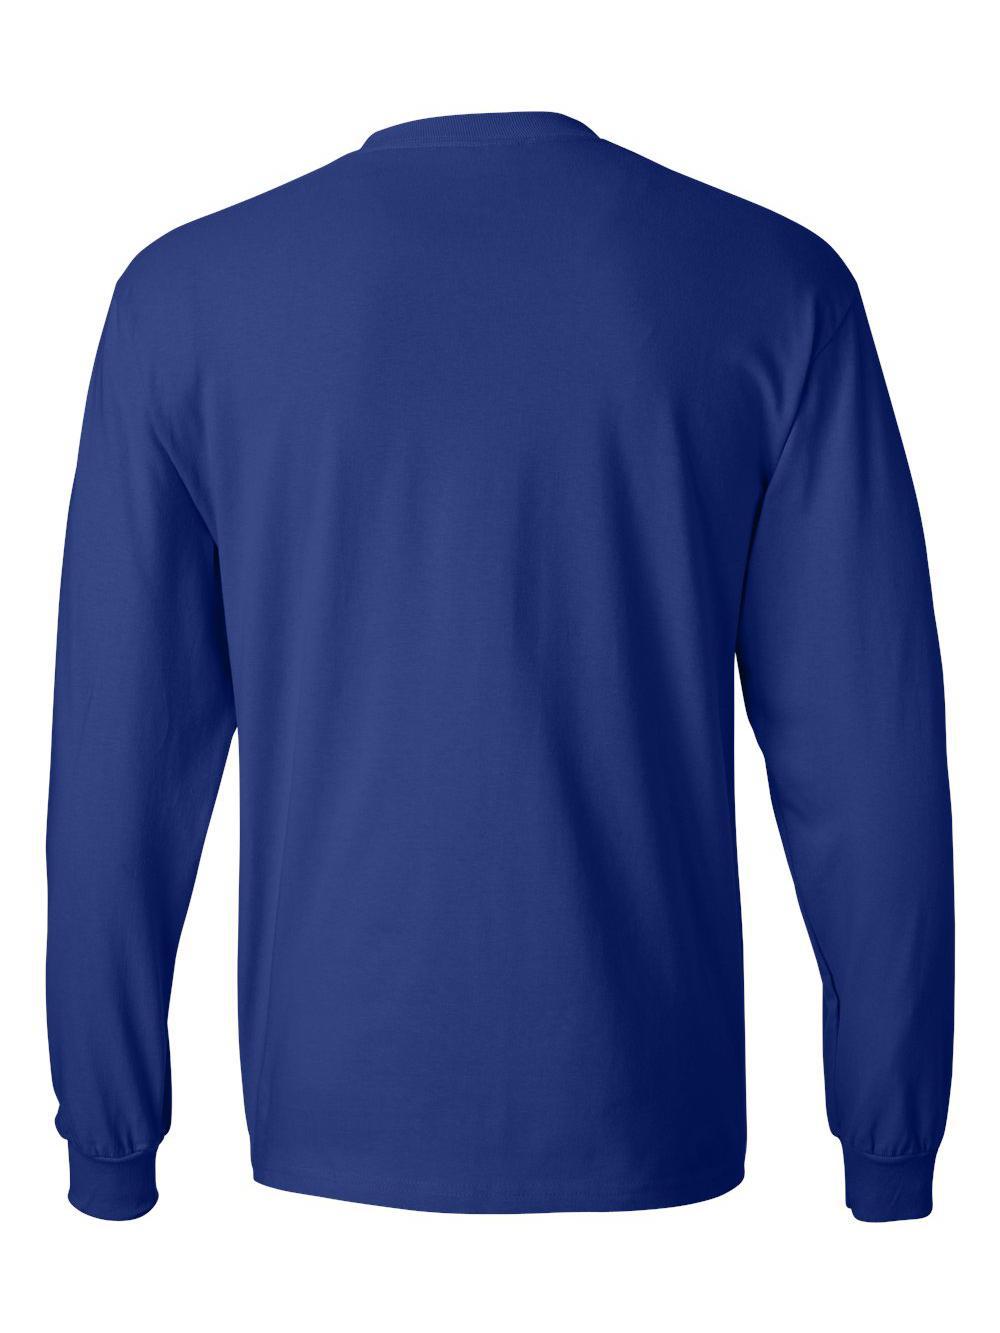 Hanes-Beefy-T-Long-Sleeve-T-Shirt-5186 thumbnail 31